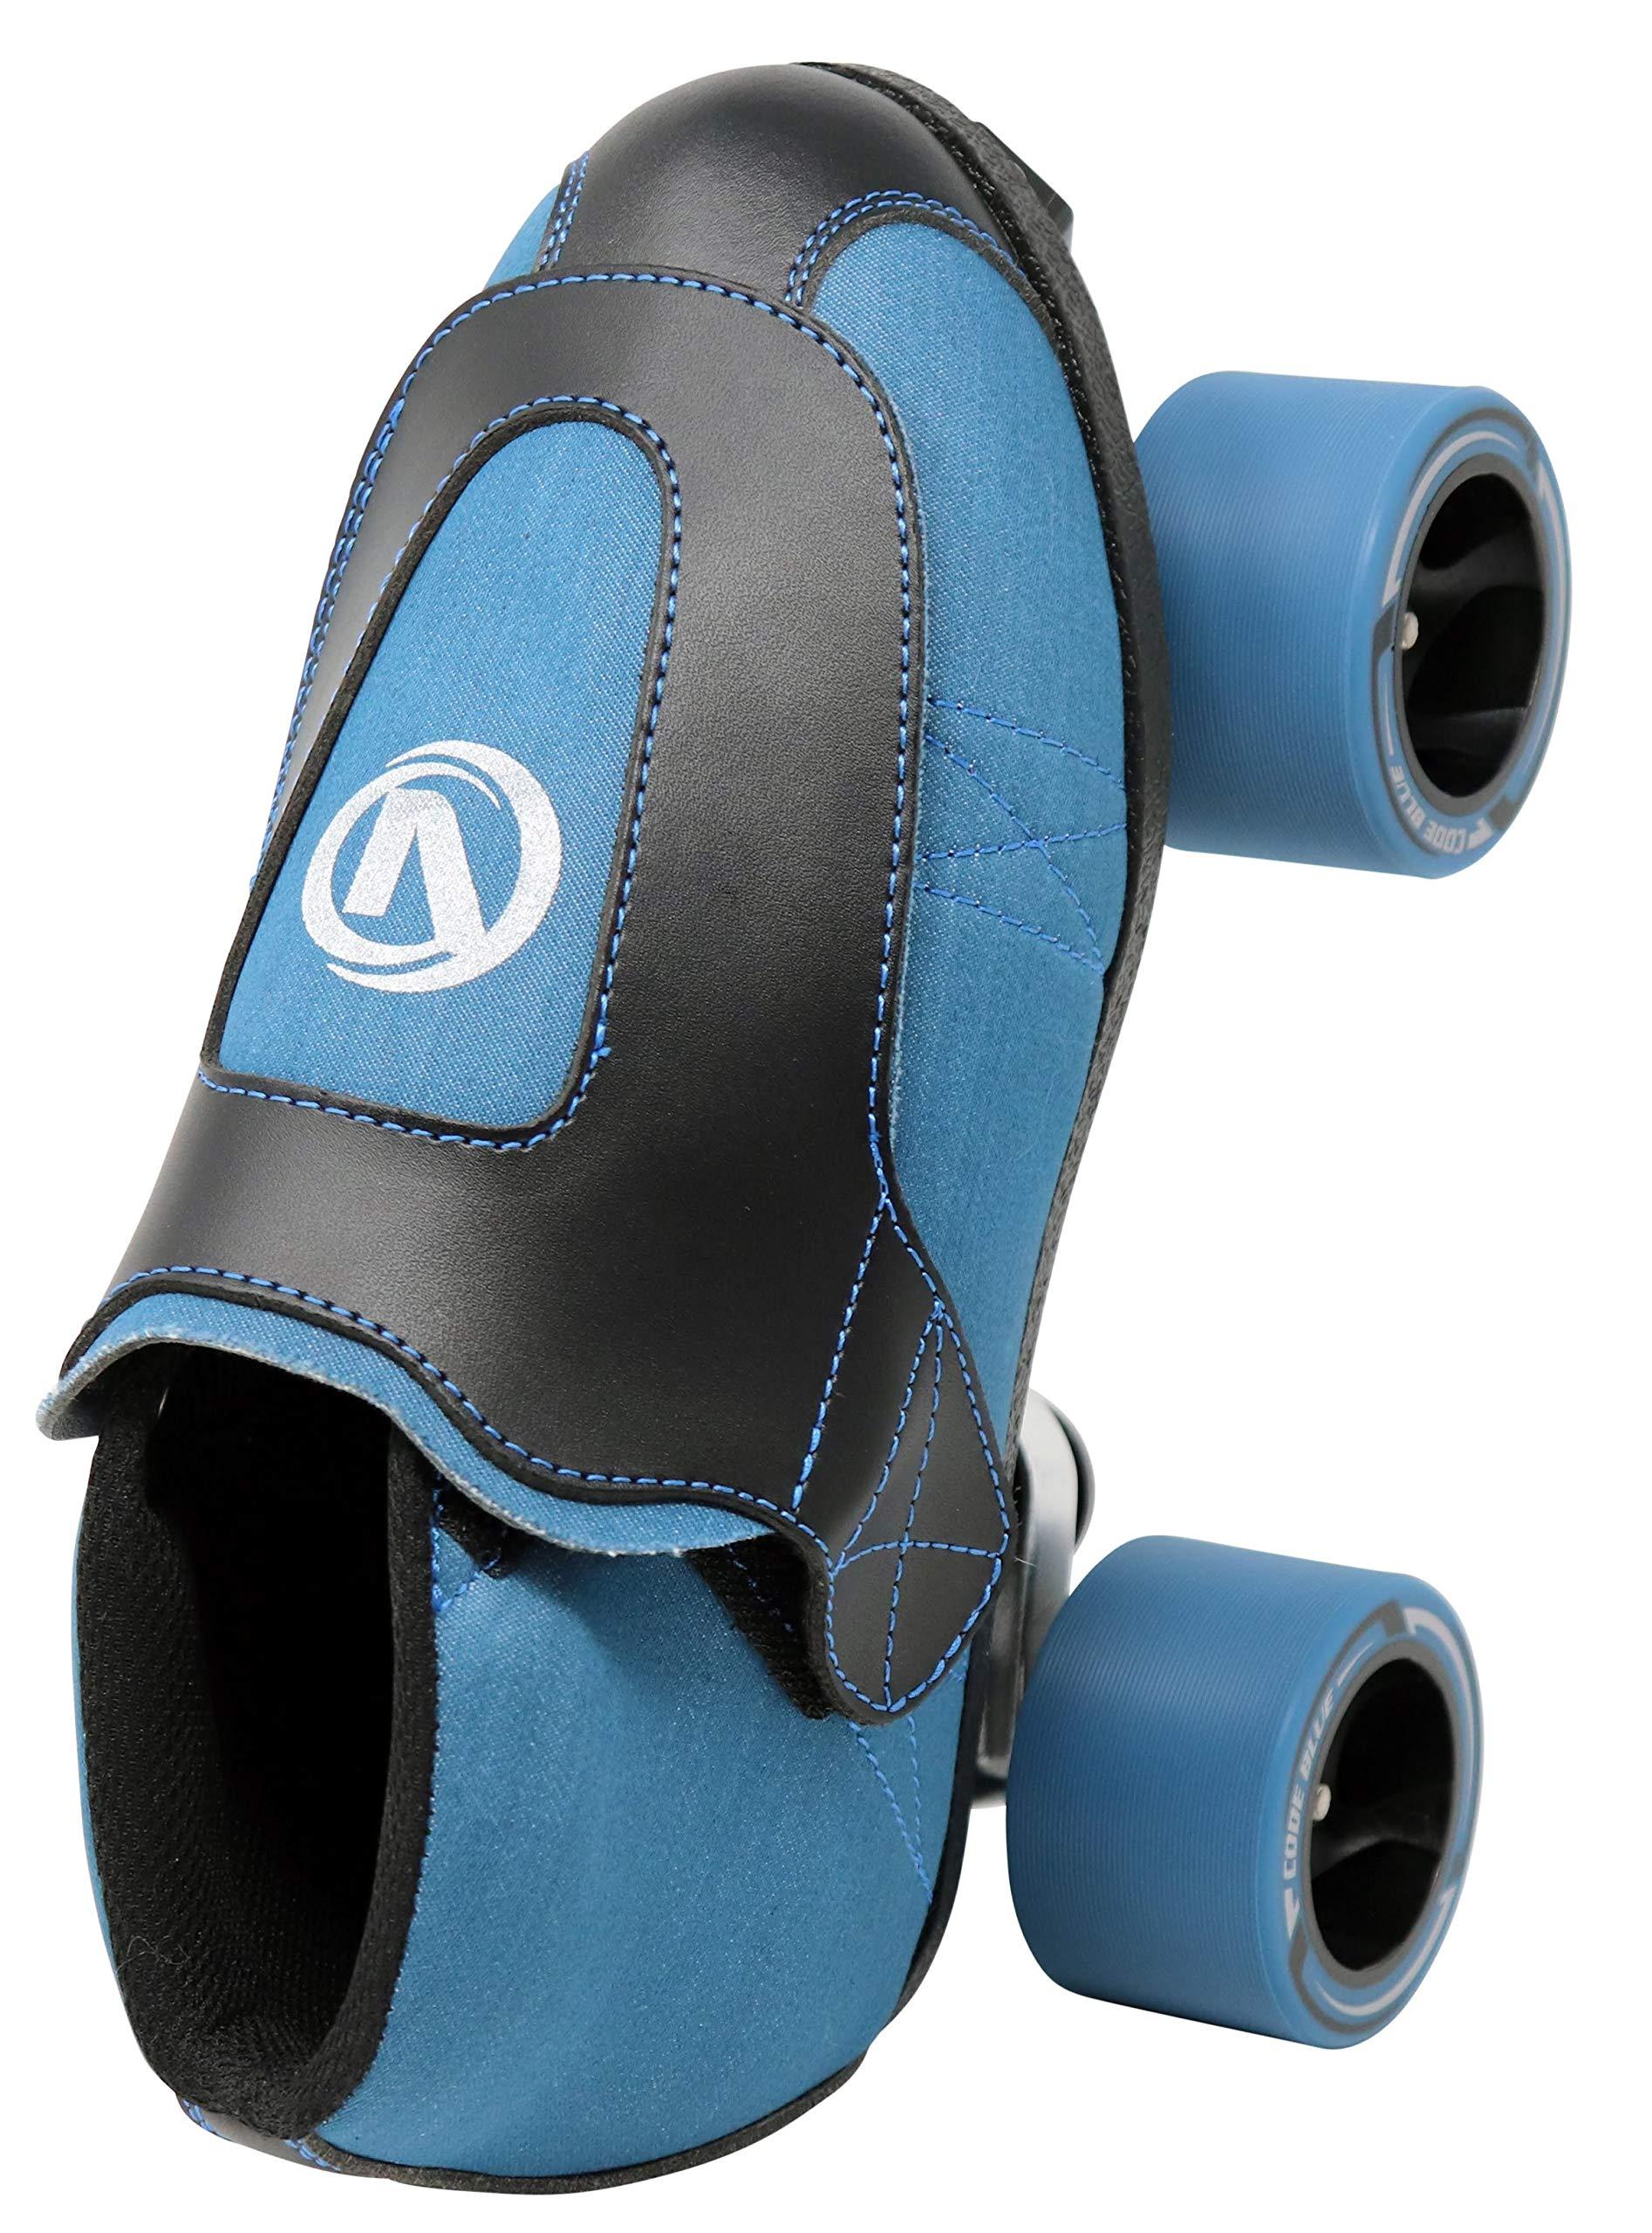 VNLA Code Blue Jam Skate - Mens & Womens Speed Skates - Quad Skates for Women & Men - Adjustable Roller Skate/Rollerskates - Outdoor & Indoor Adult Quad Skate - Kid/Kids Roller Skates (Size 3) by VNLA (Image #4)